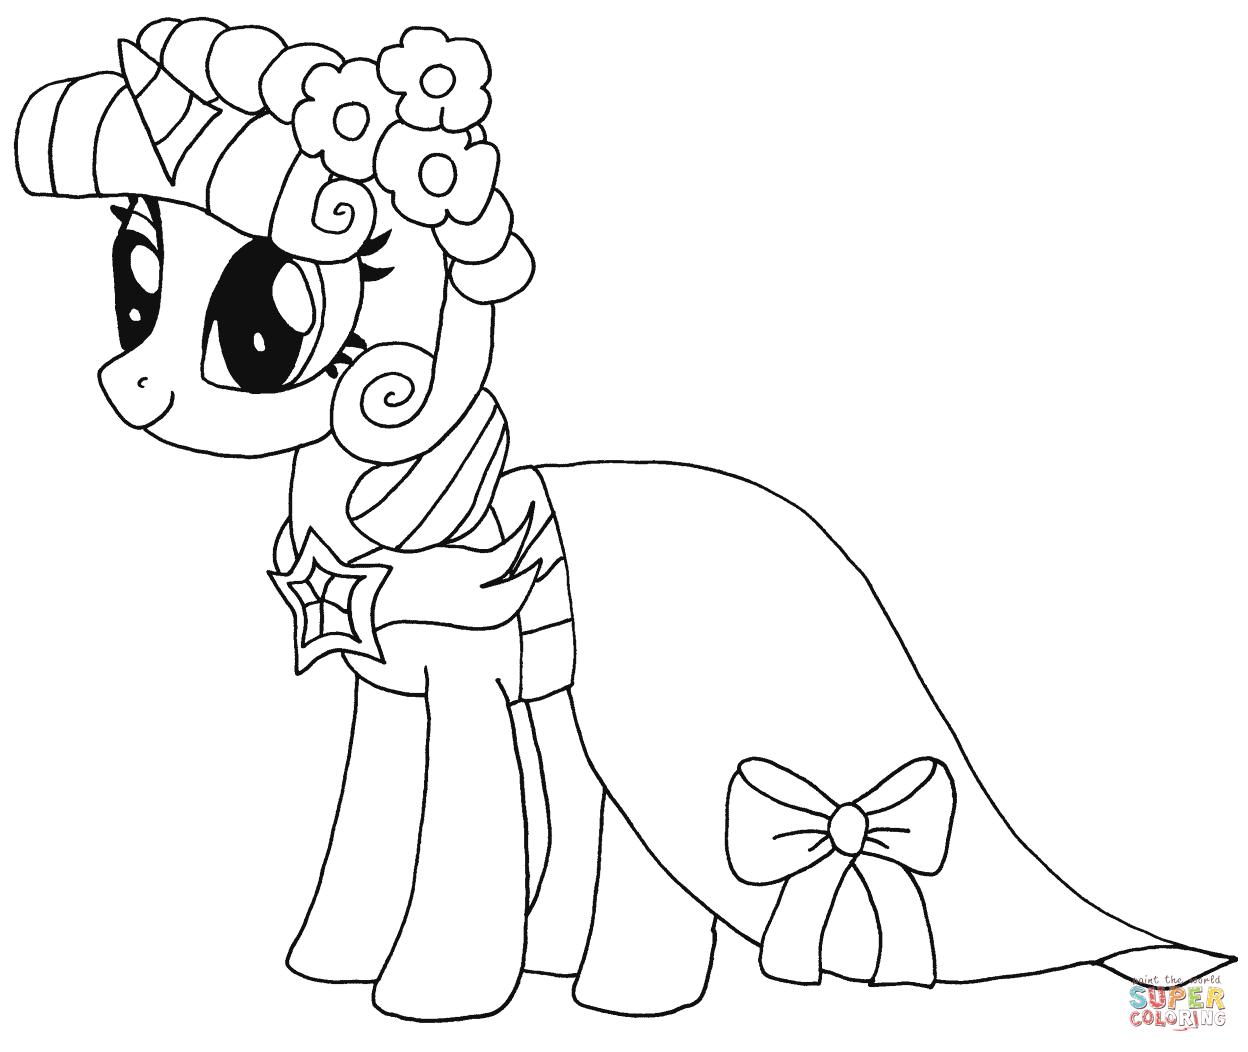 Princess Twilight Sparkle from My Little Pony